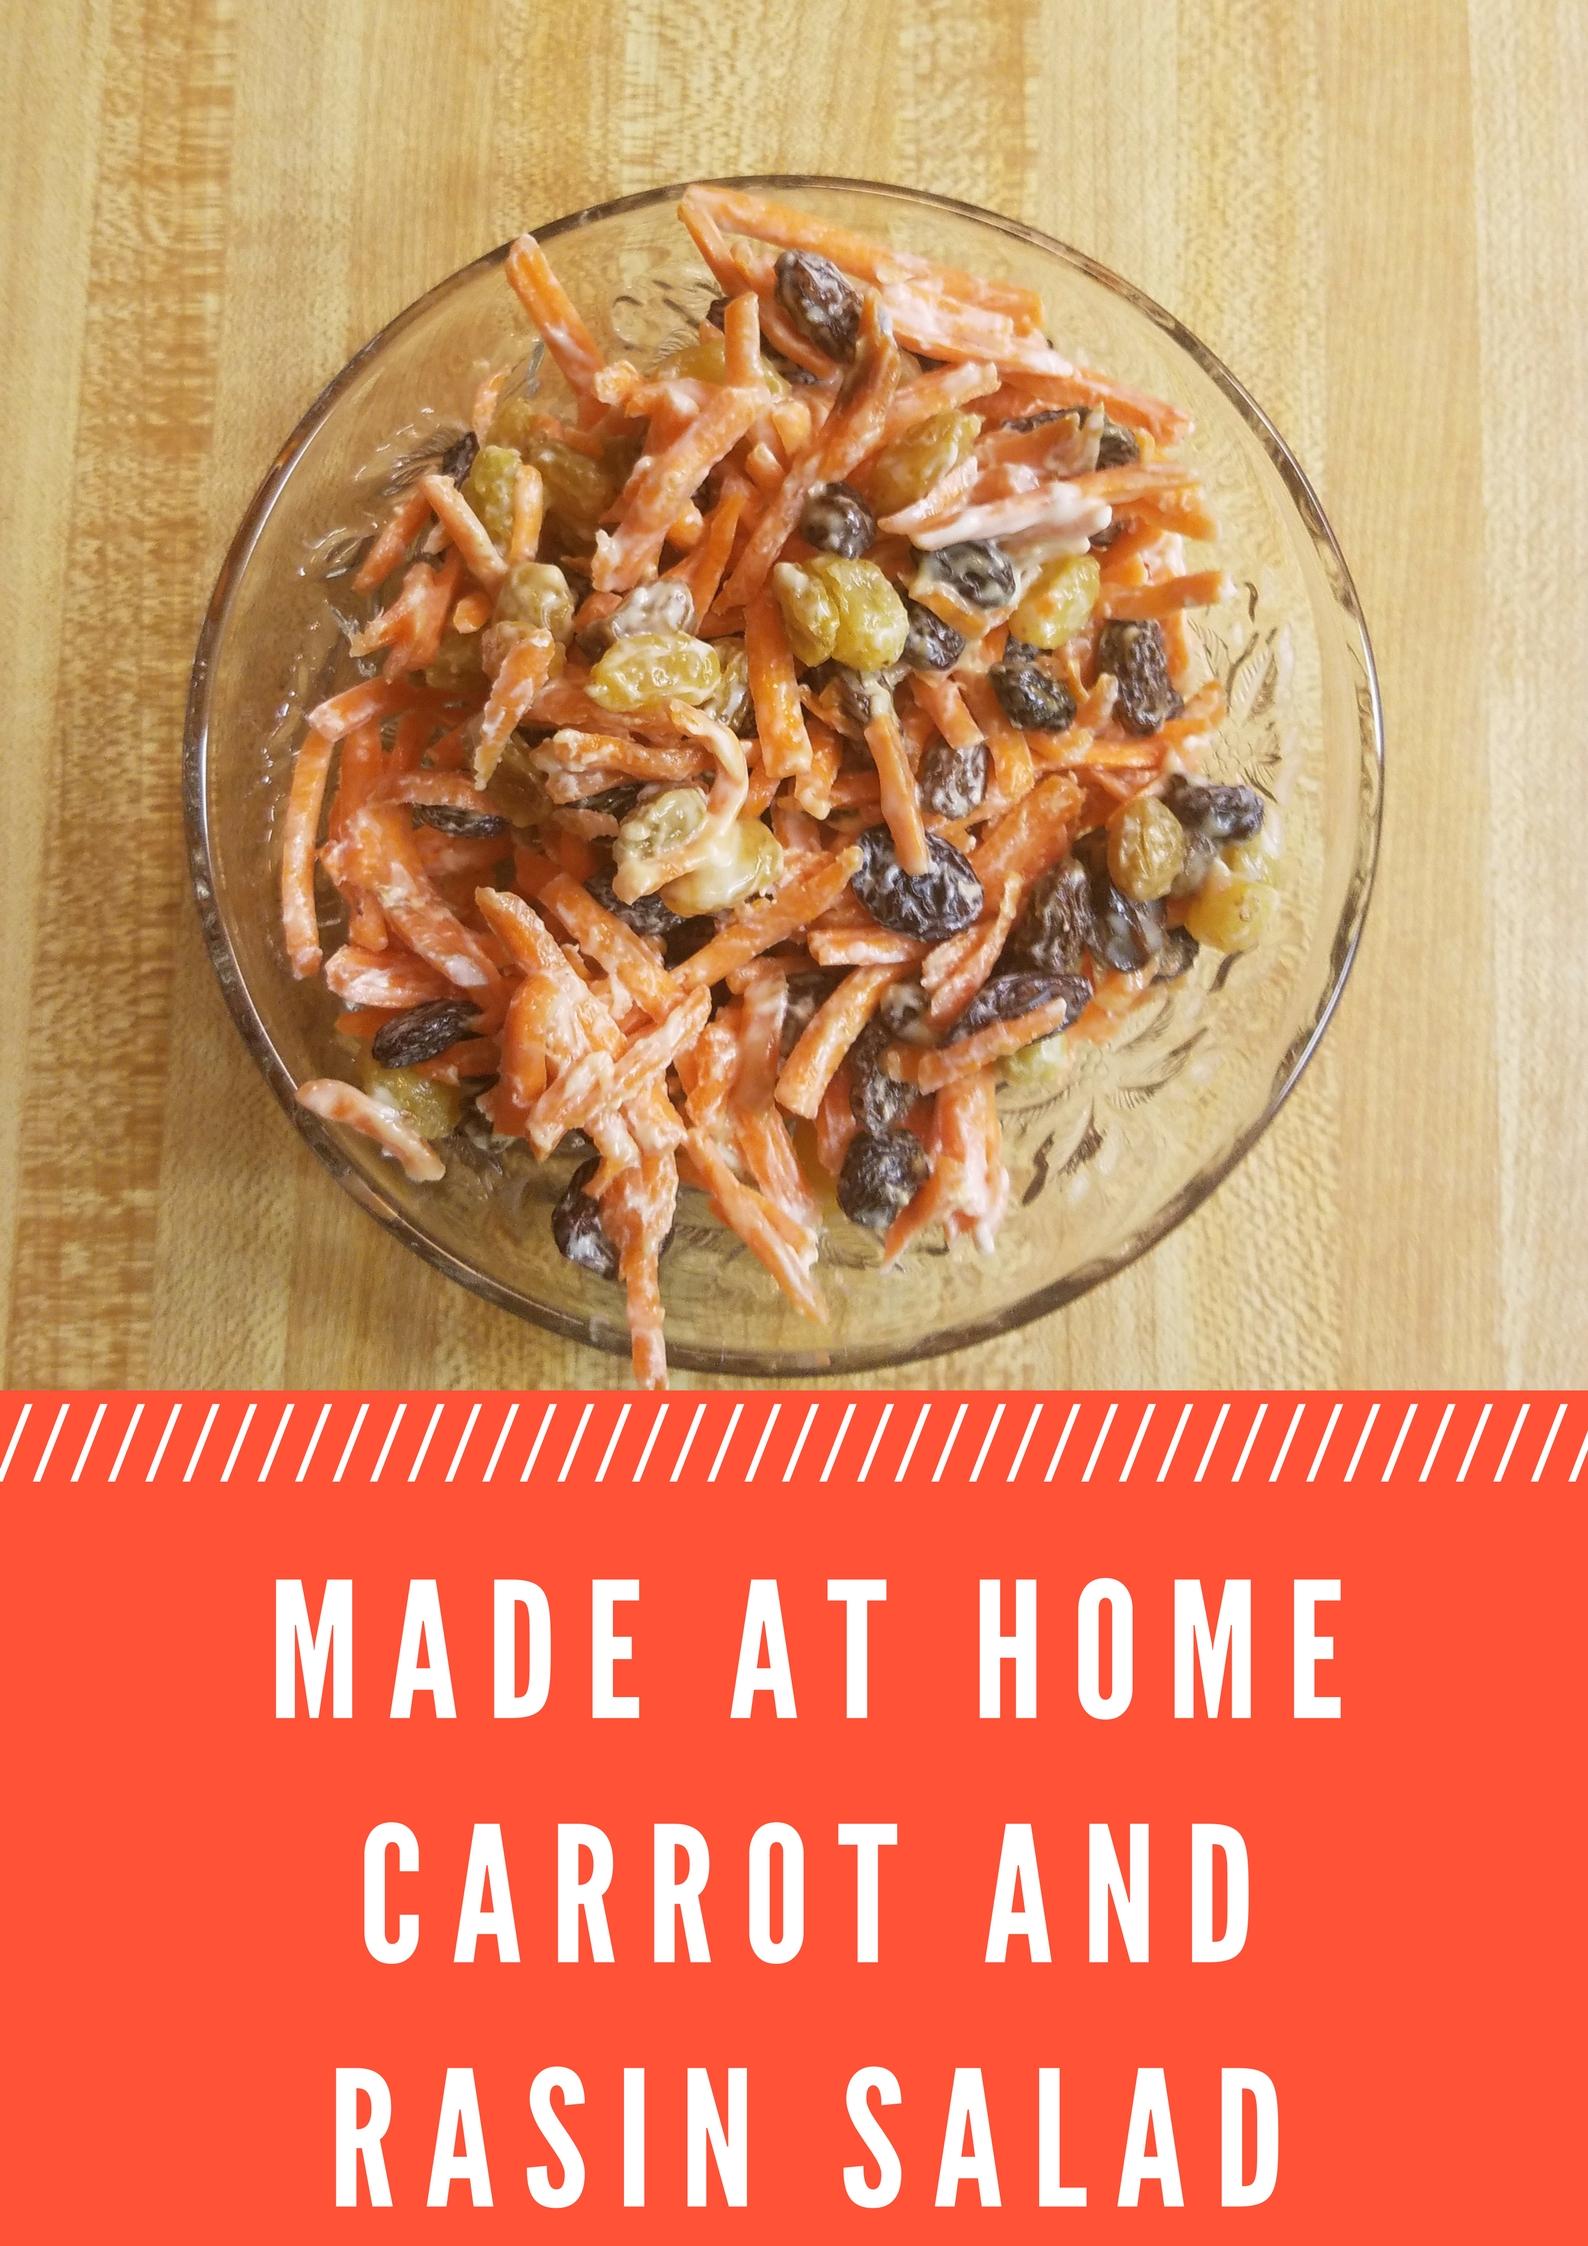 Raisin and Carrot Salad